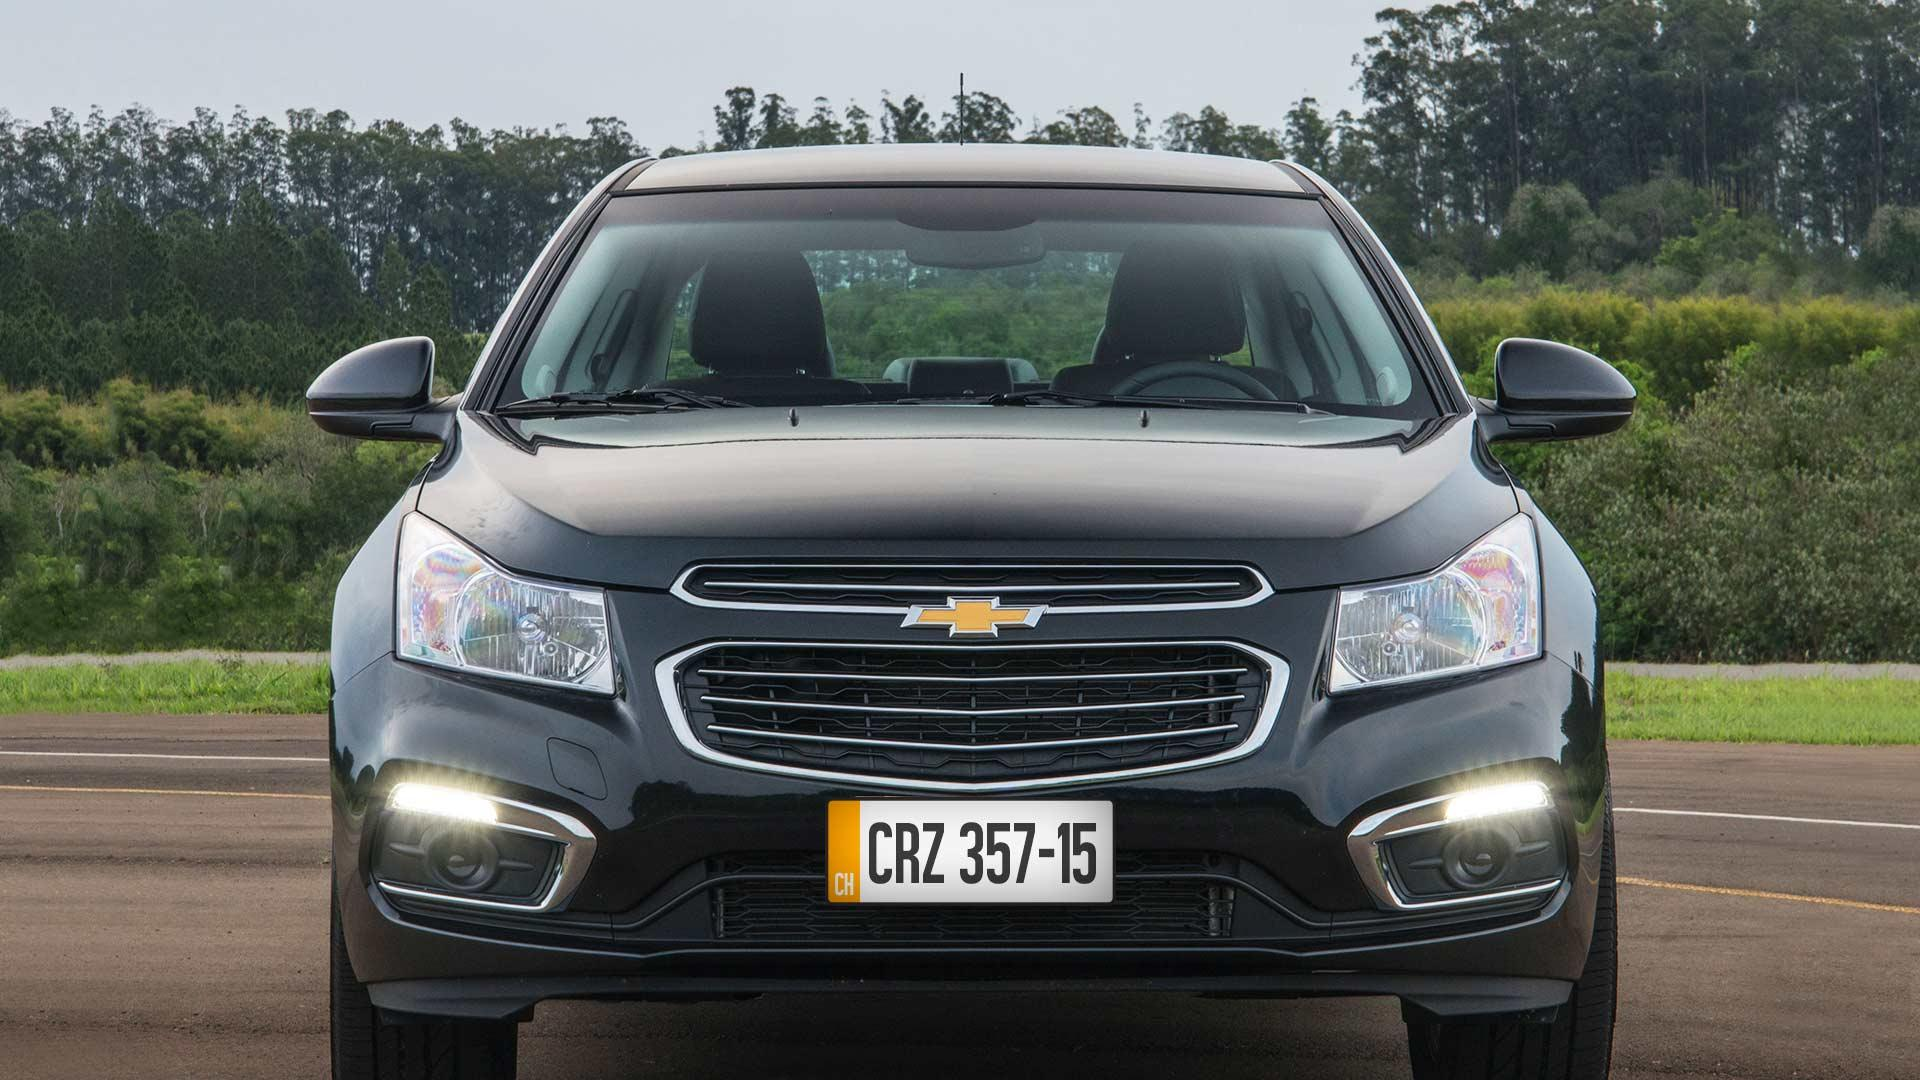 Chevrolet Cruze Sedan 2017